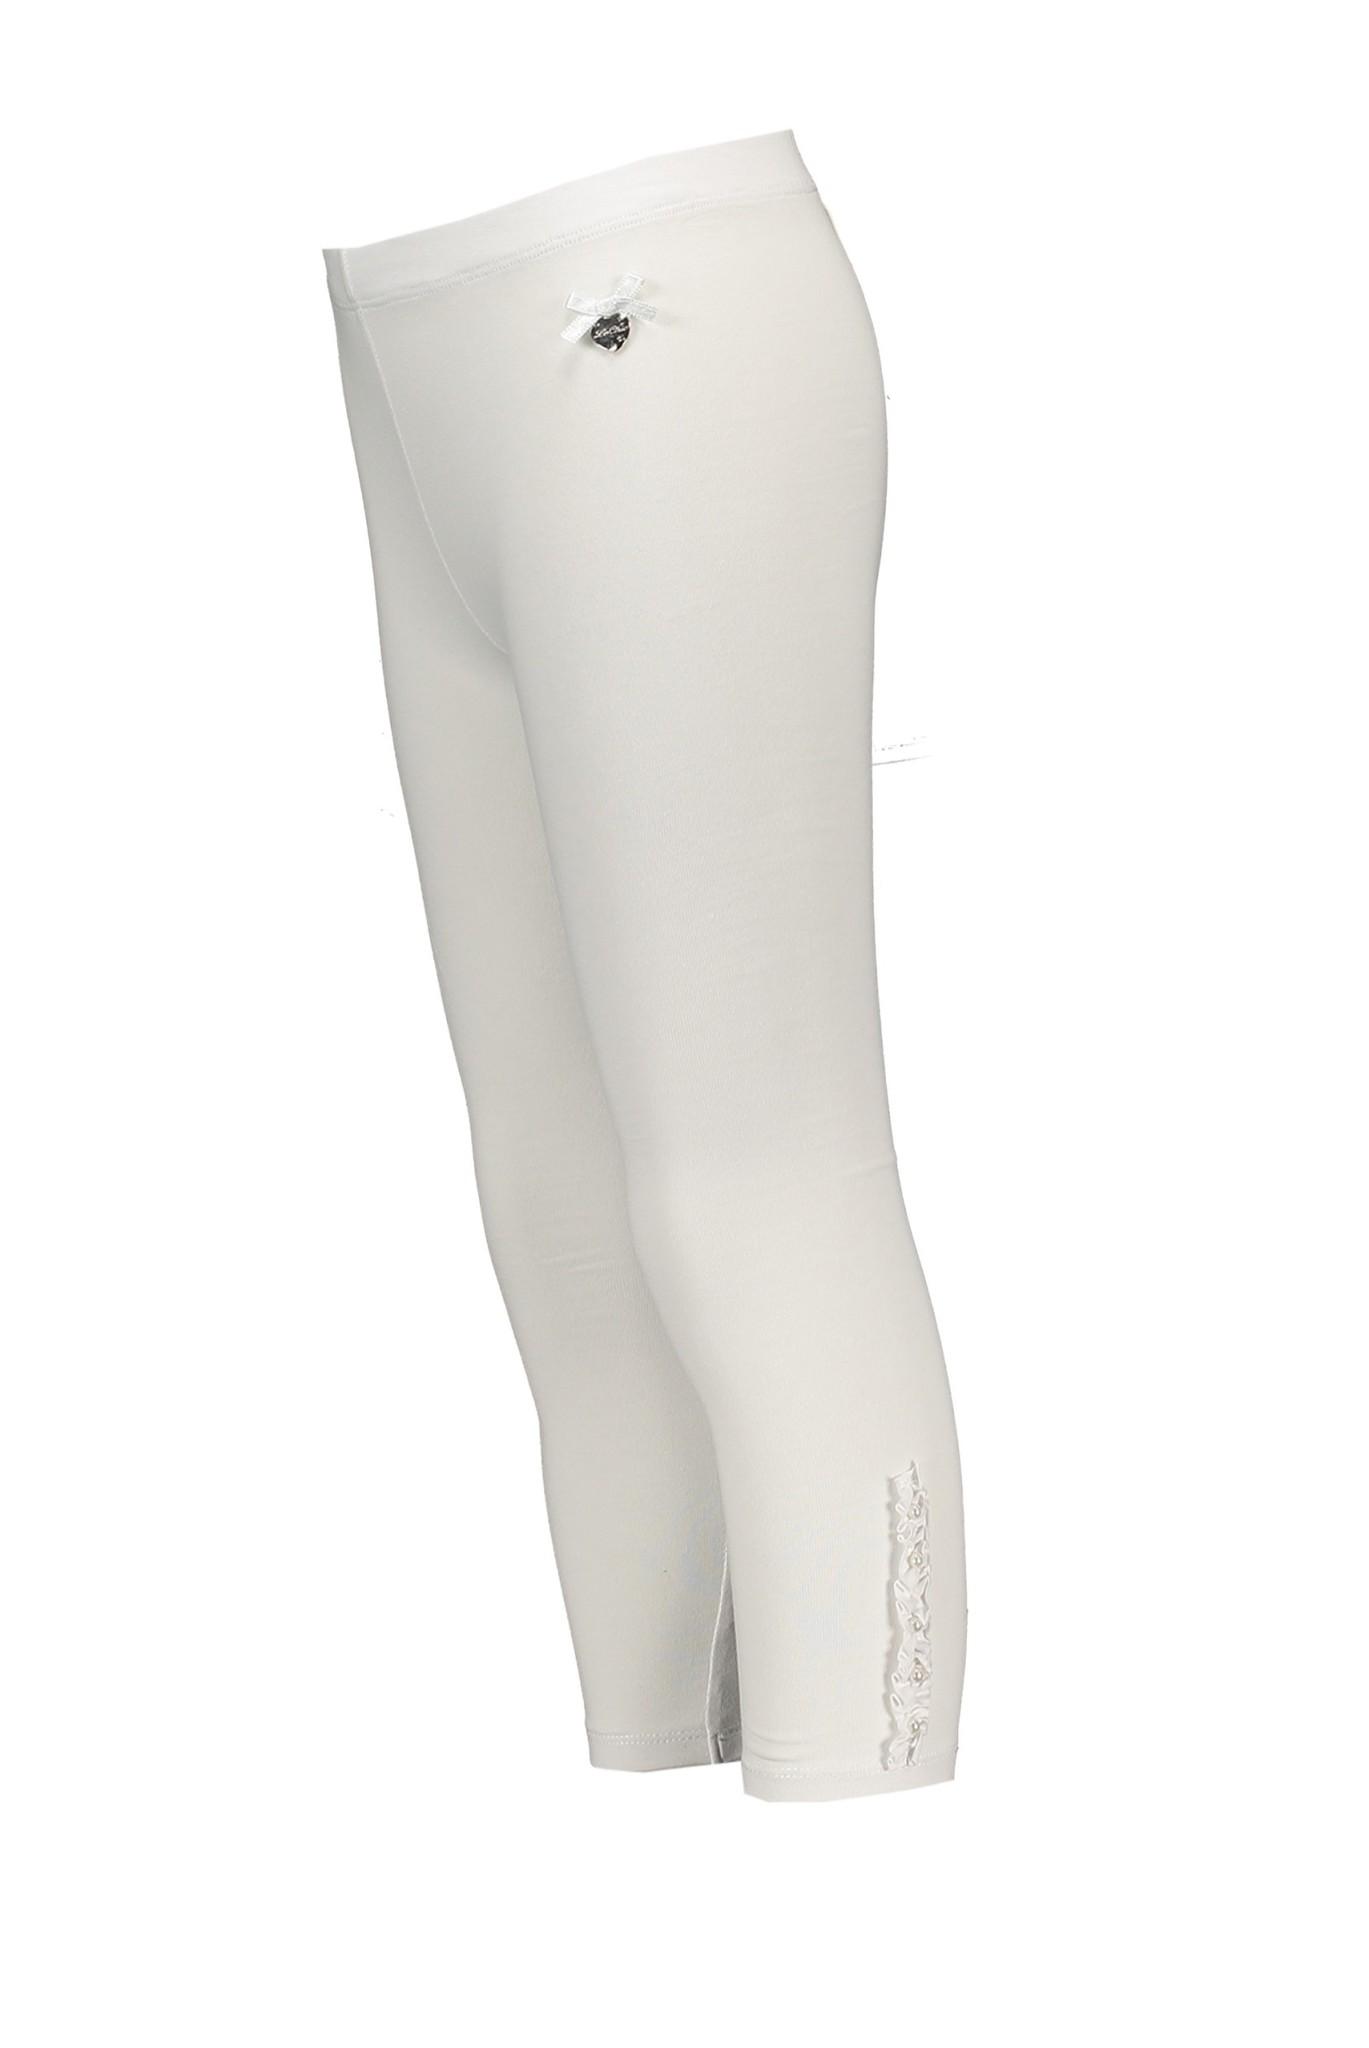 Lechic Le Chic Ruffle & Pearl White Legging